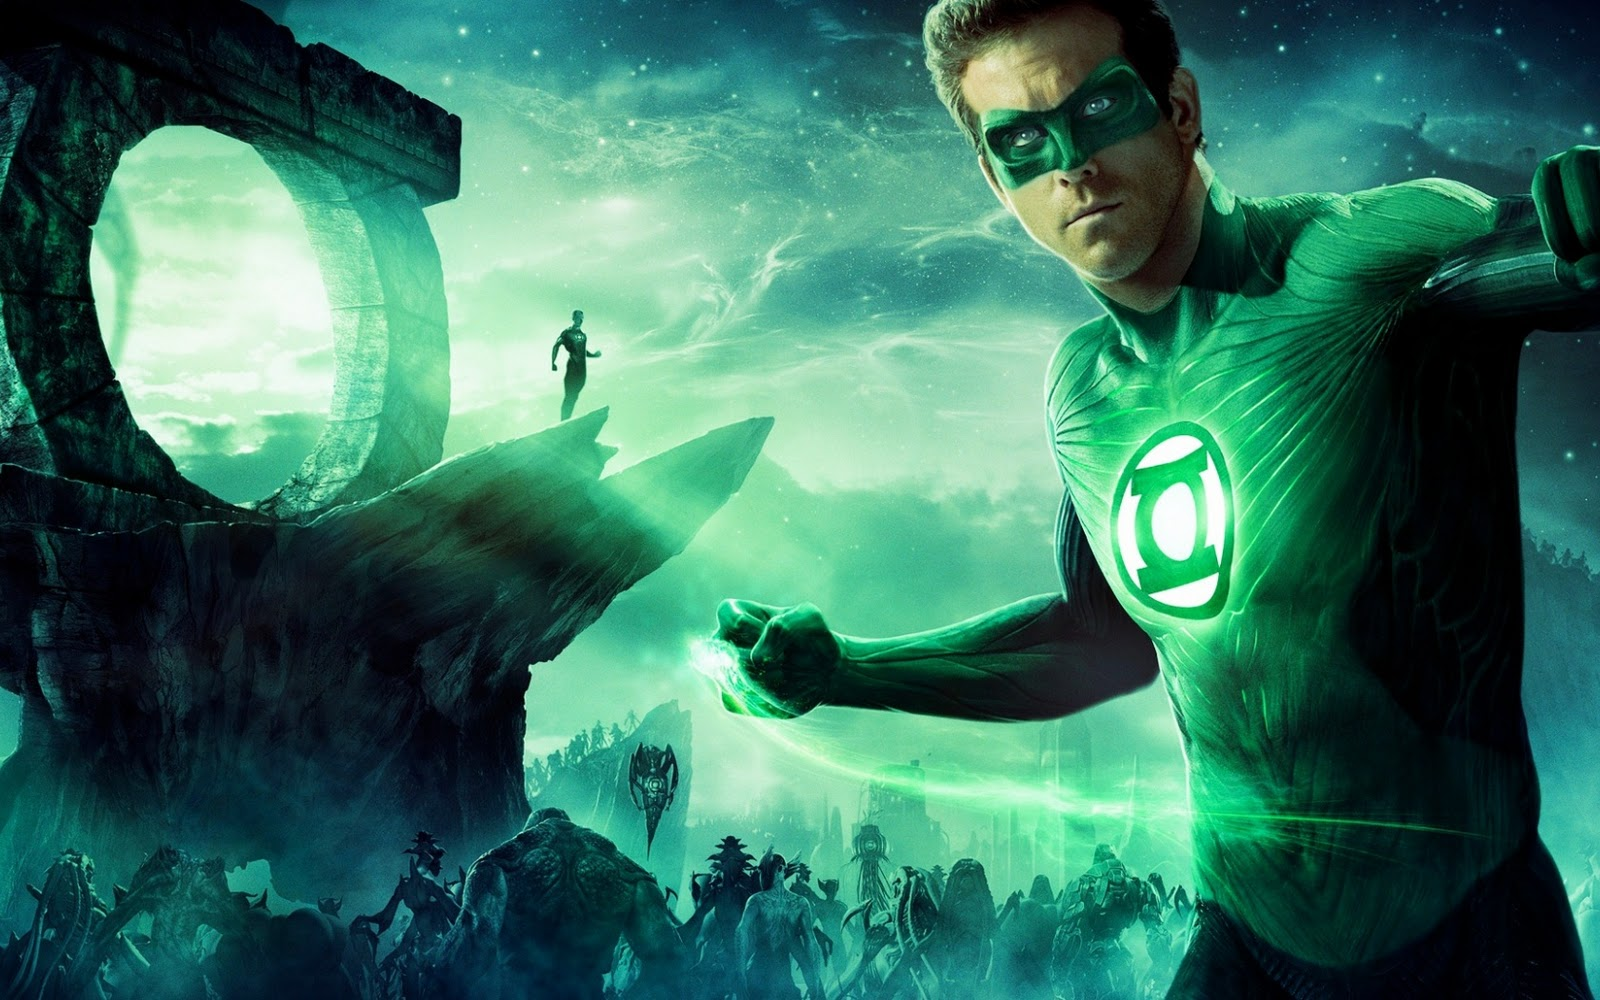 2011 Green Lantern Movie 1680x1050 ADULT FILM: Supergirl XXX teaser trailer arrives (Safe For Work)